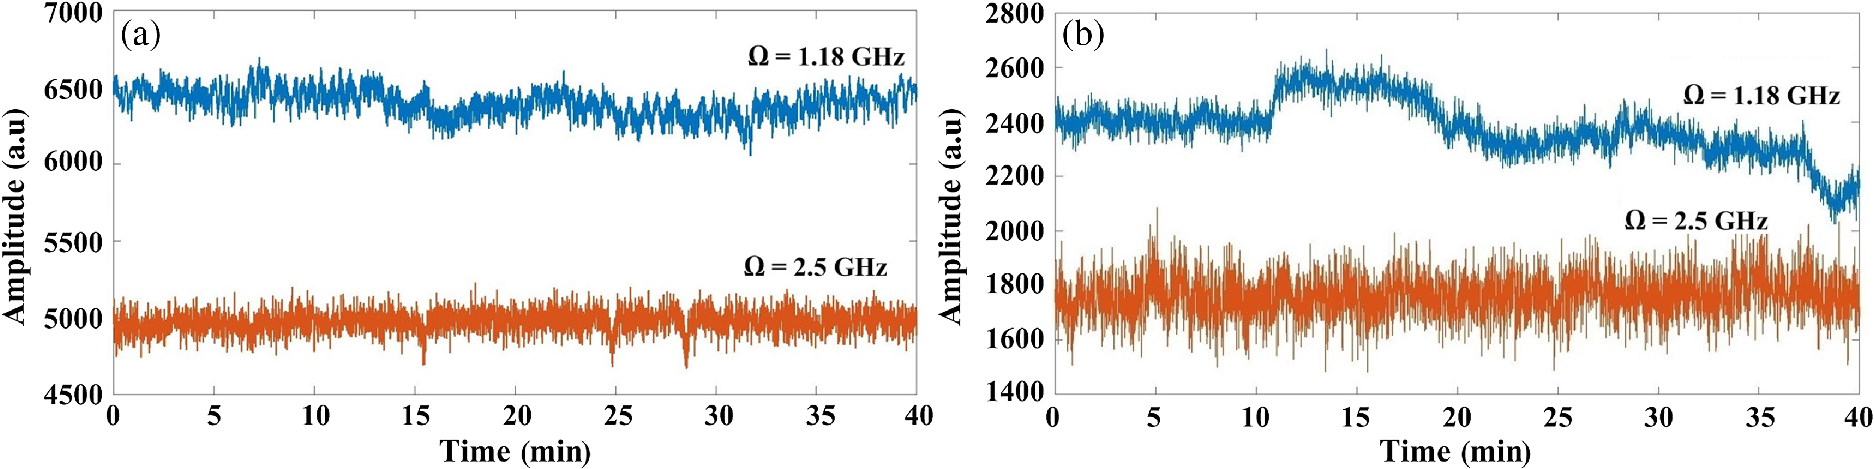 Molecular dispersion spectroscopy in a CO2-filled all-fiber